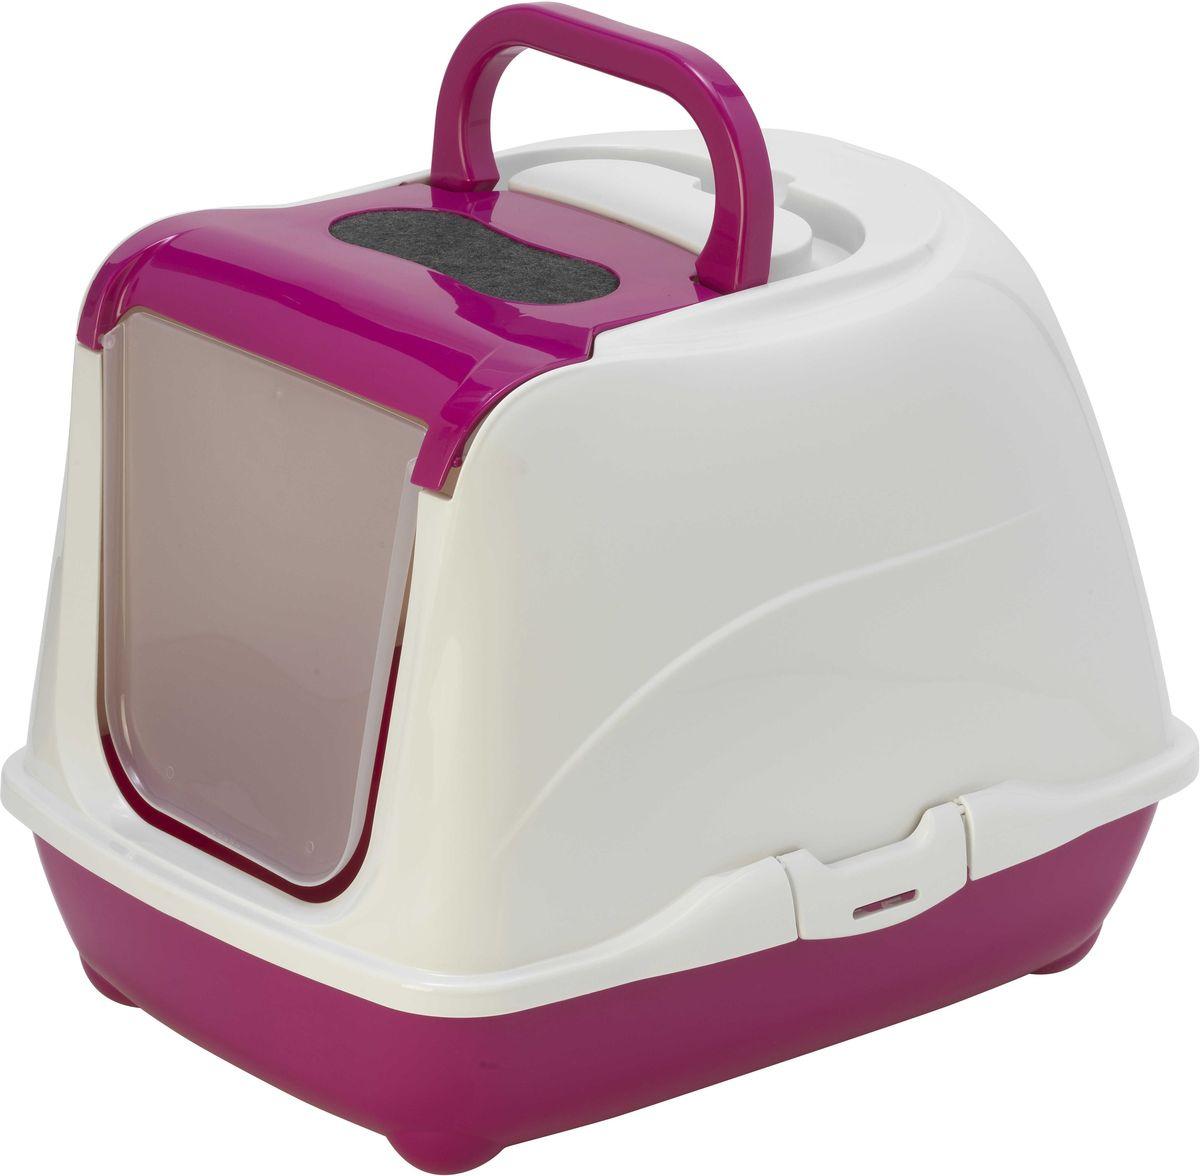 Туалет закрытый для кошек Moderna Flip Cat, цвет: ярко-розовый, 39 х 50 х 37 см14C230328